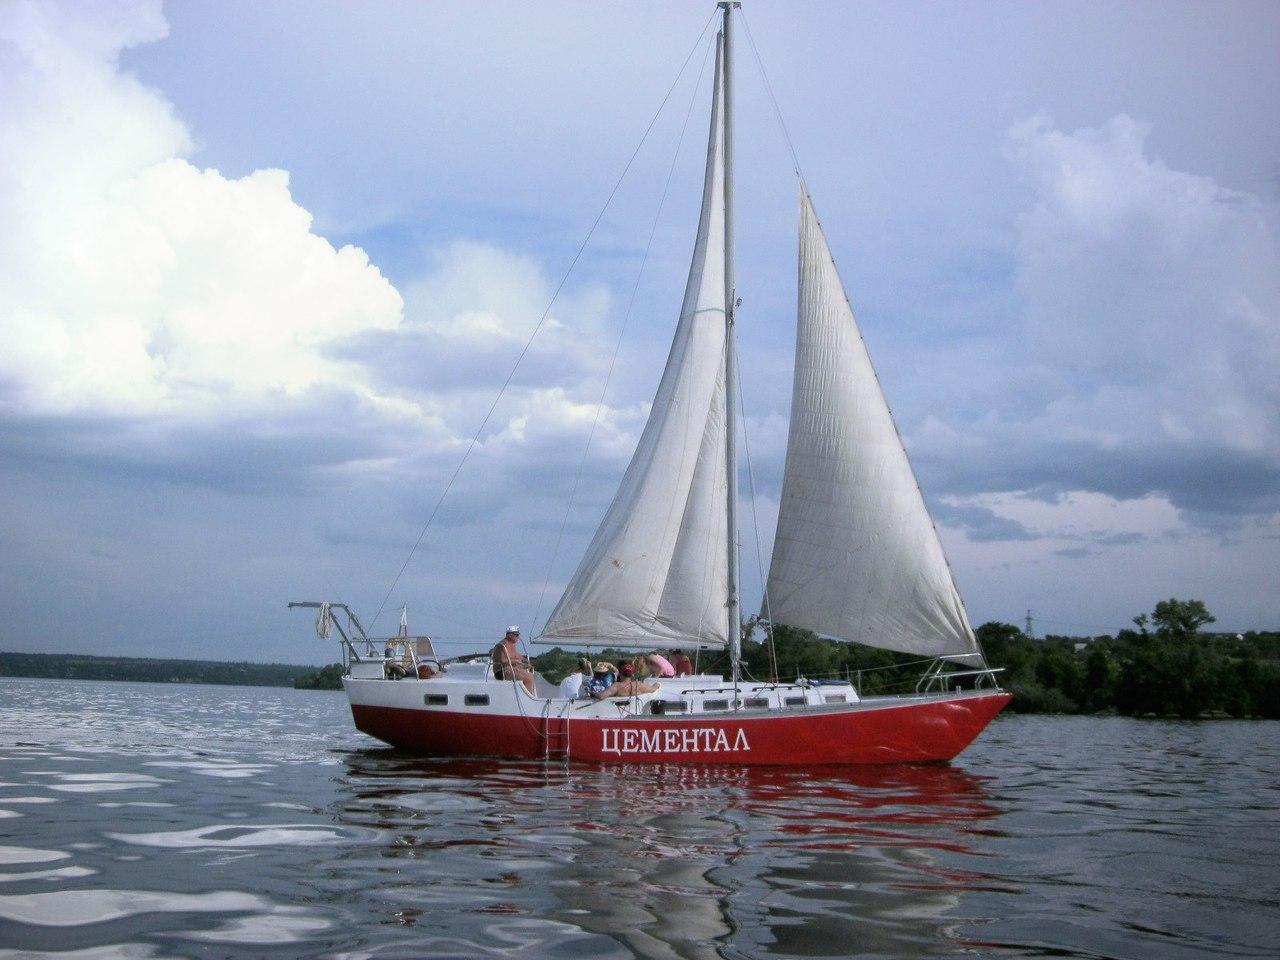 Парусная яхта Цементал Днепропетровск  (2)